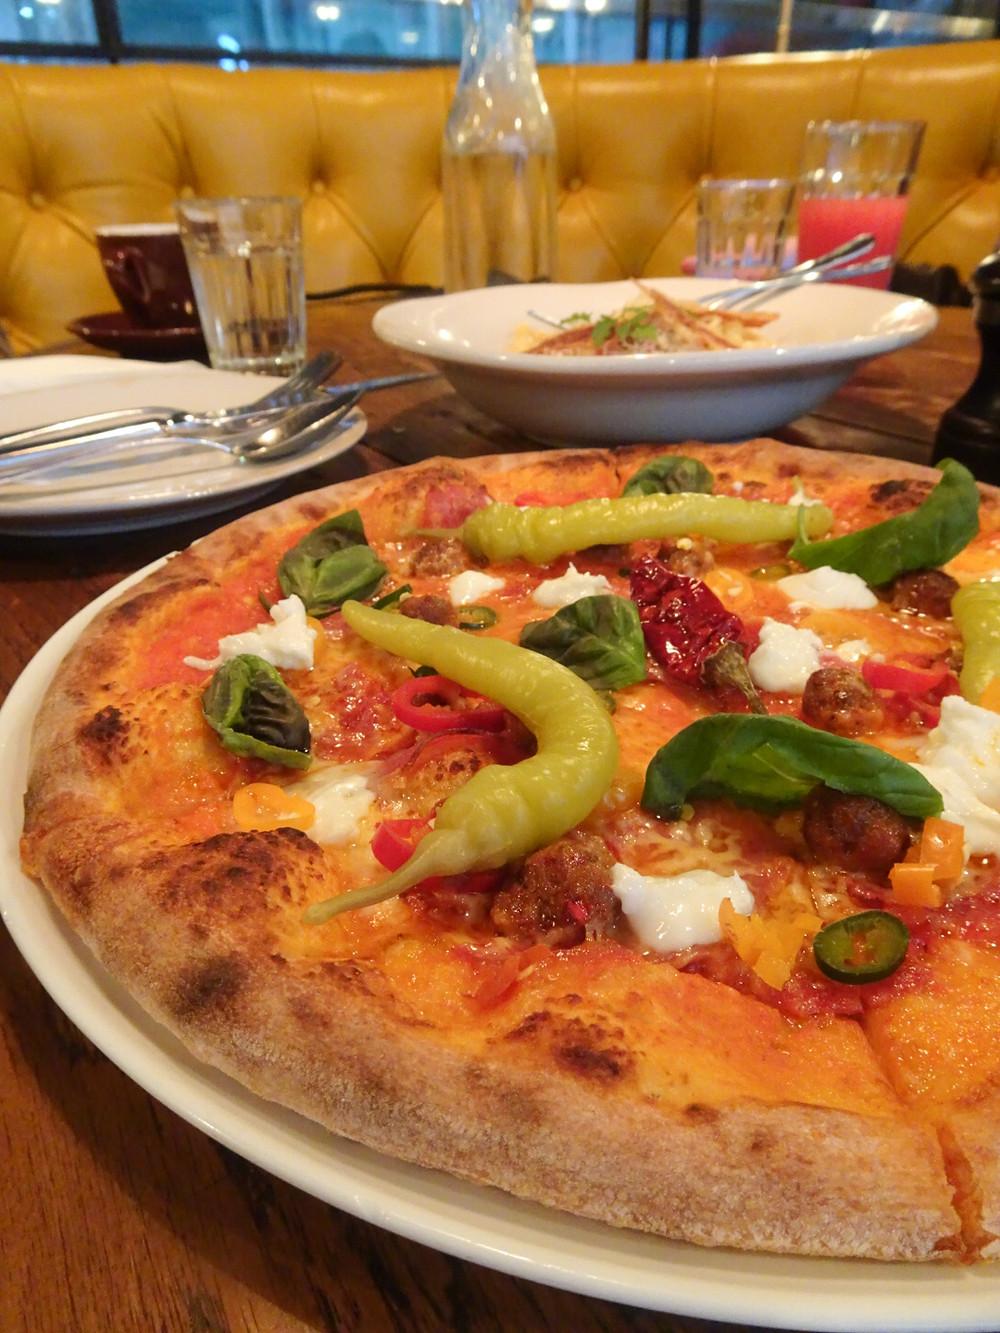 Food at Jamie's Italian restaurant in Hong Kong